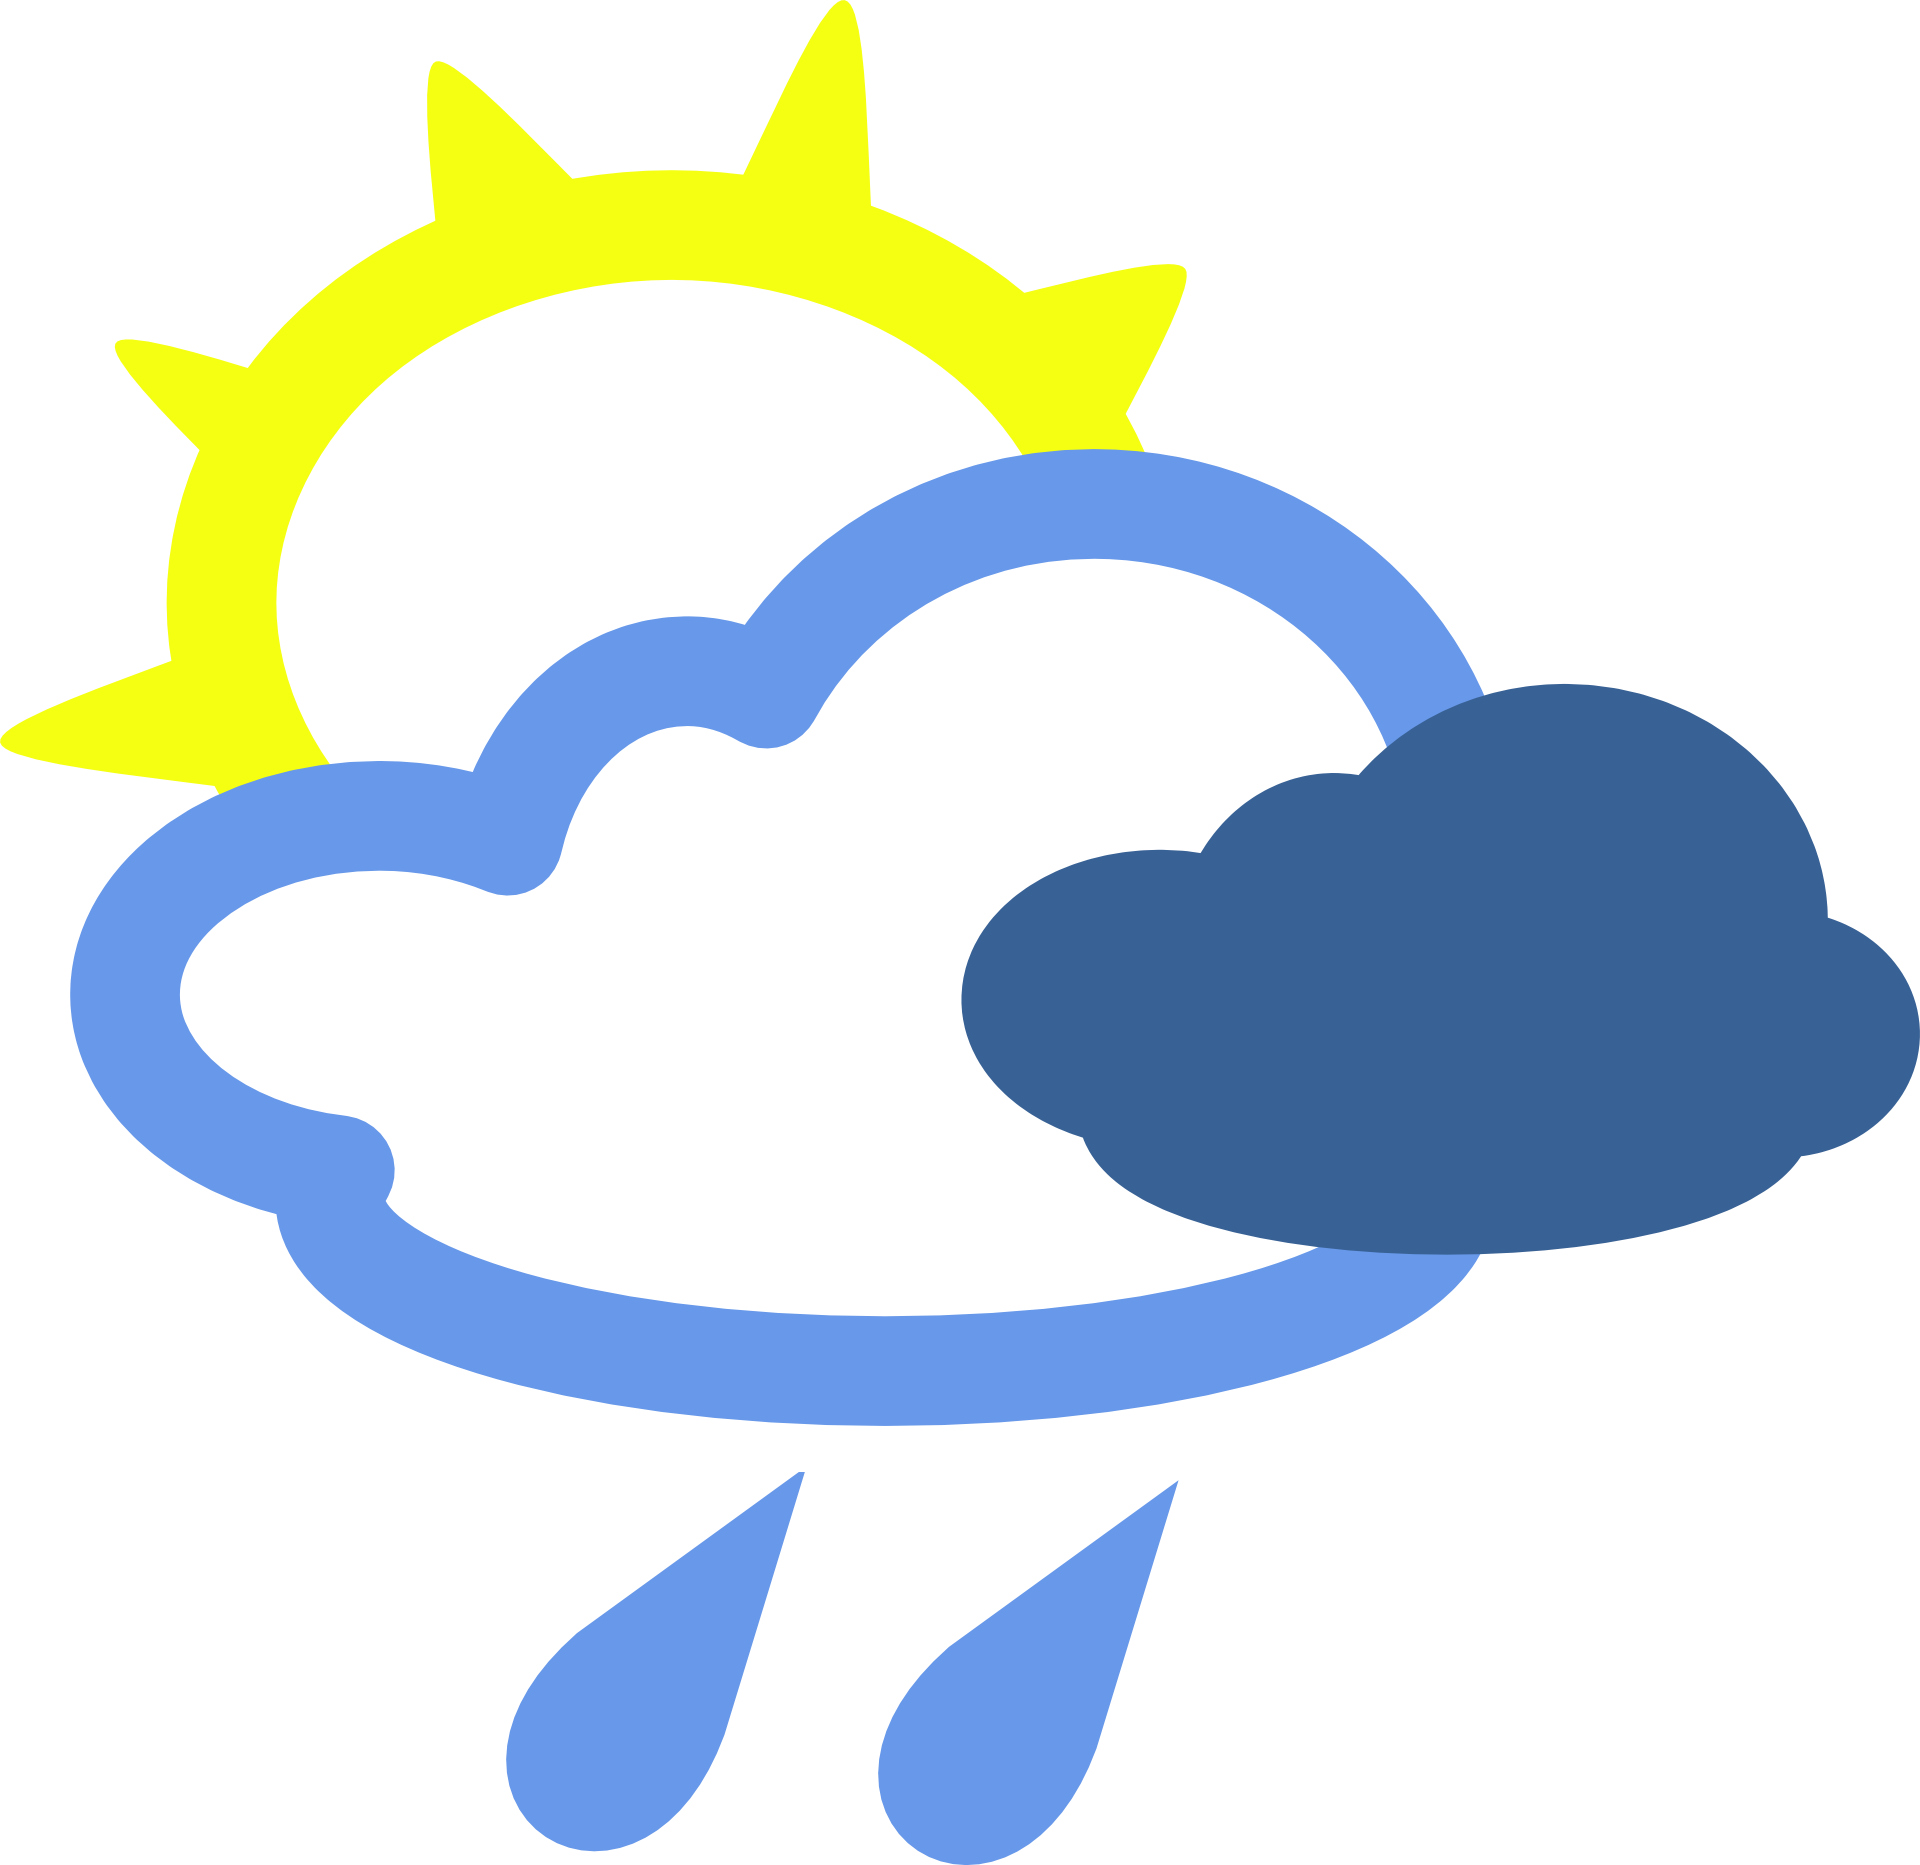 clip art download Symbol png image purepng. Transparent weather forecast